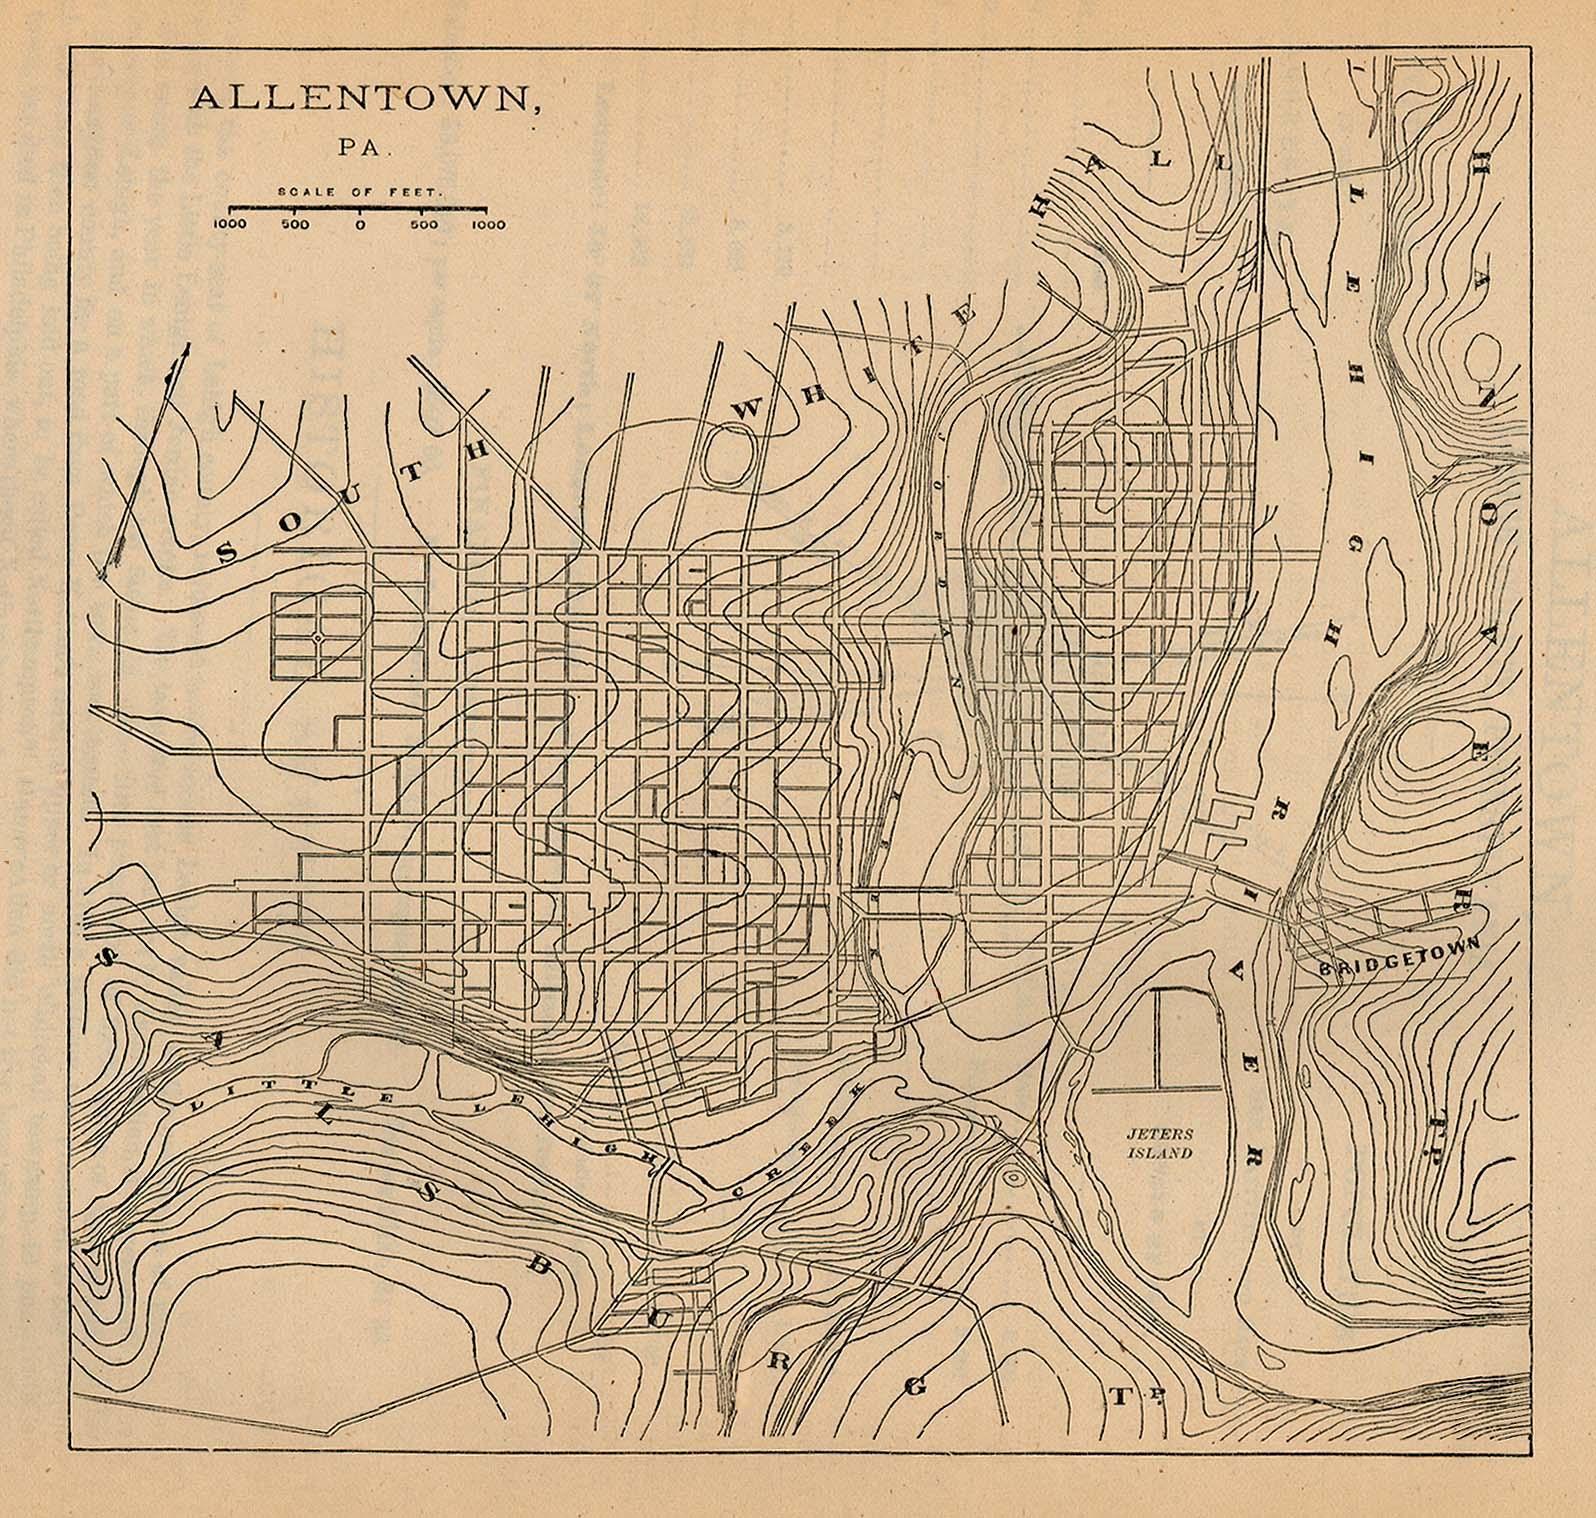 Allentown City Map, Pennsylvania, United States 1880